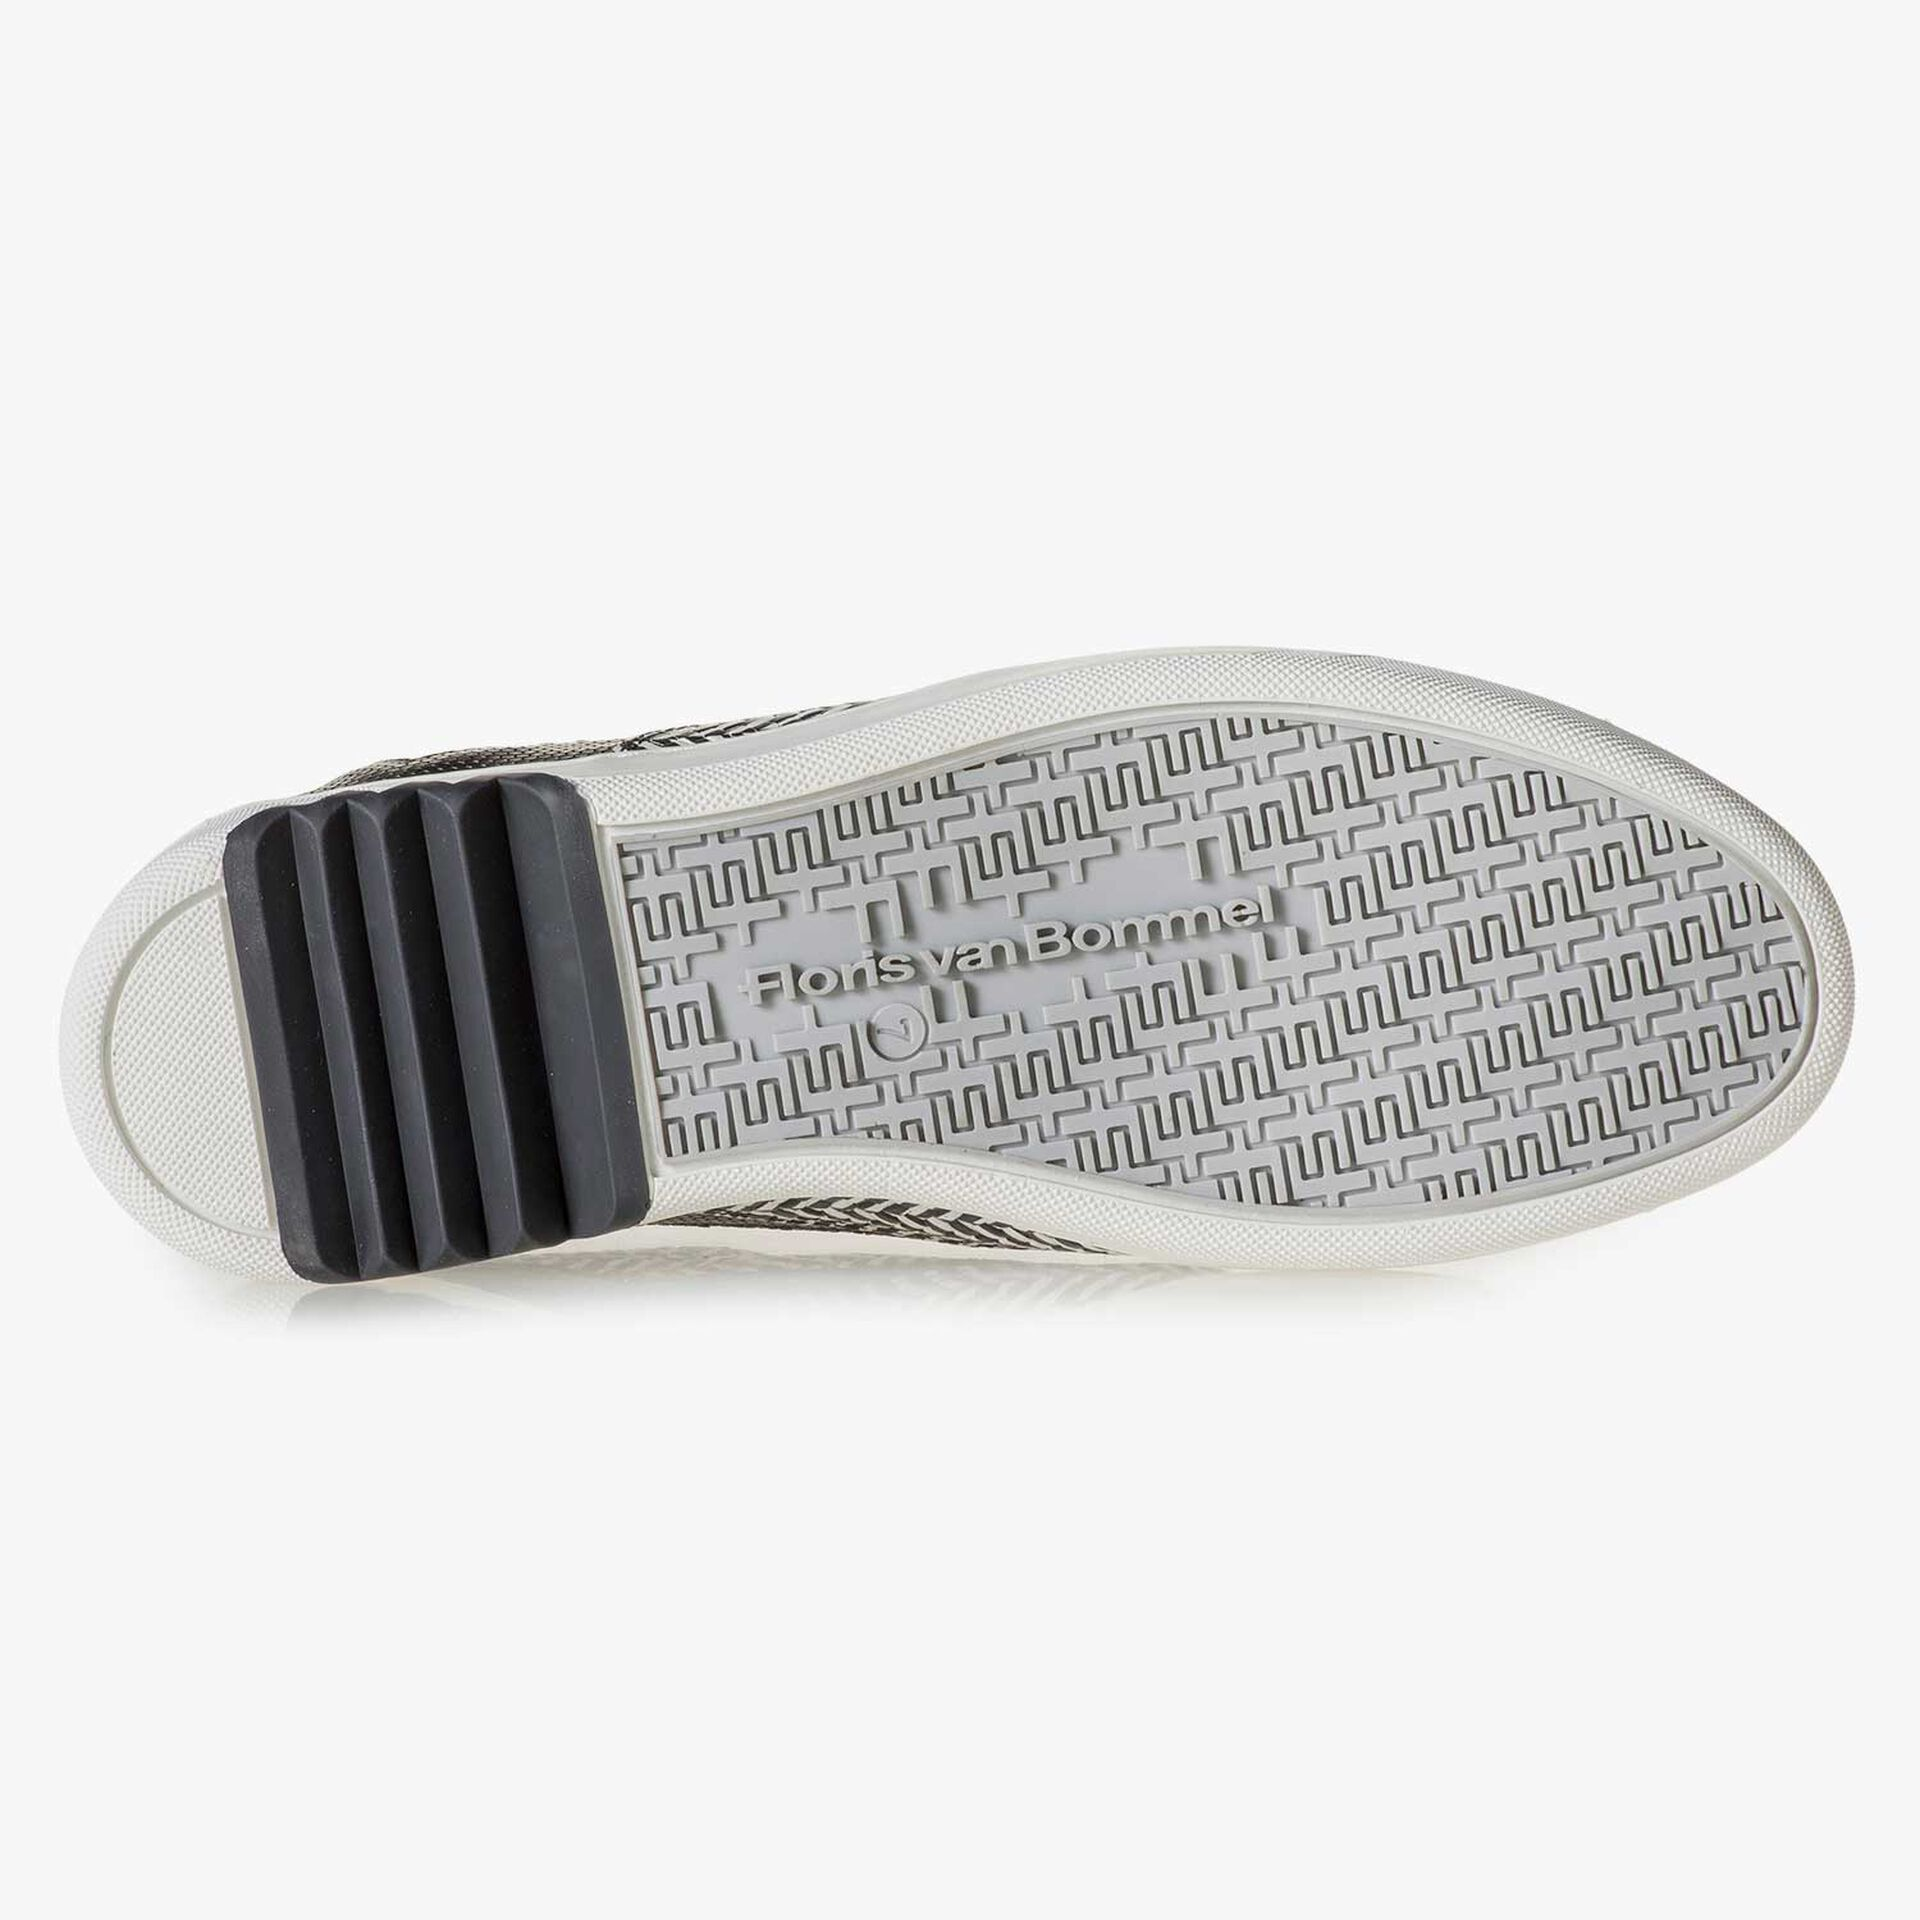 Black & white leather sneaker with a herringbone pattern